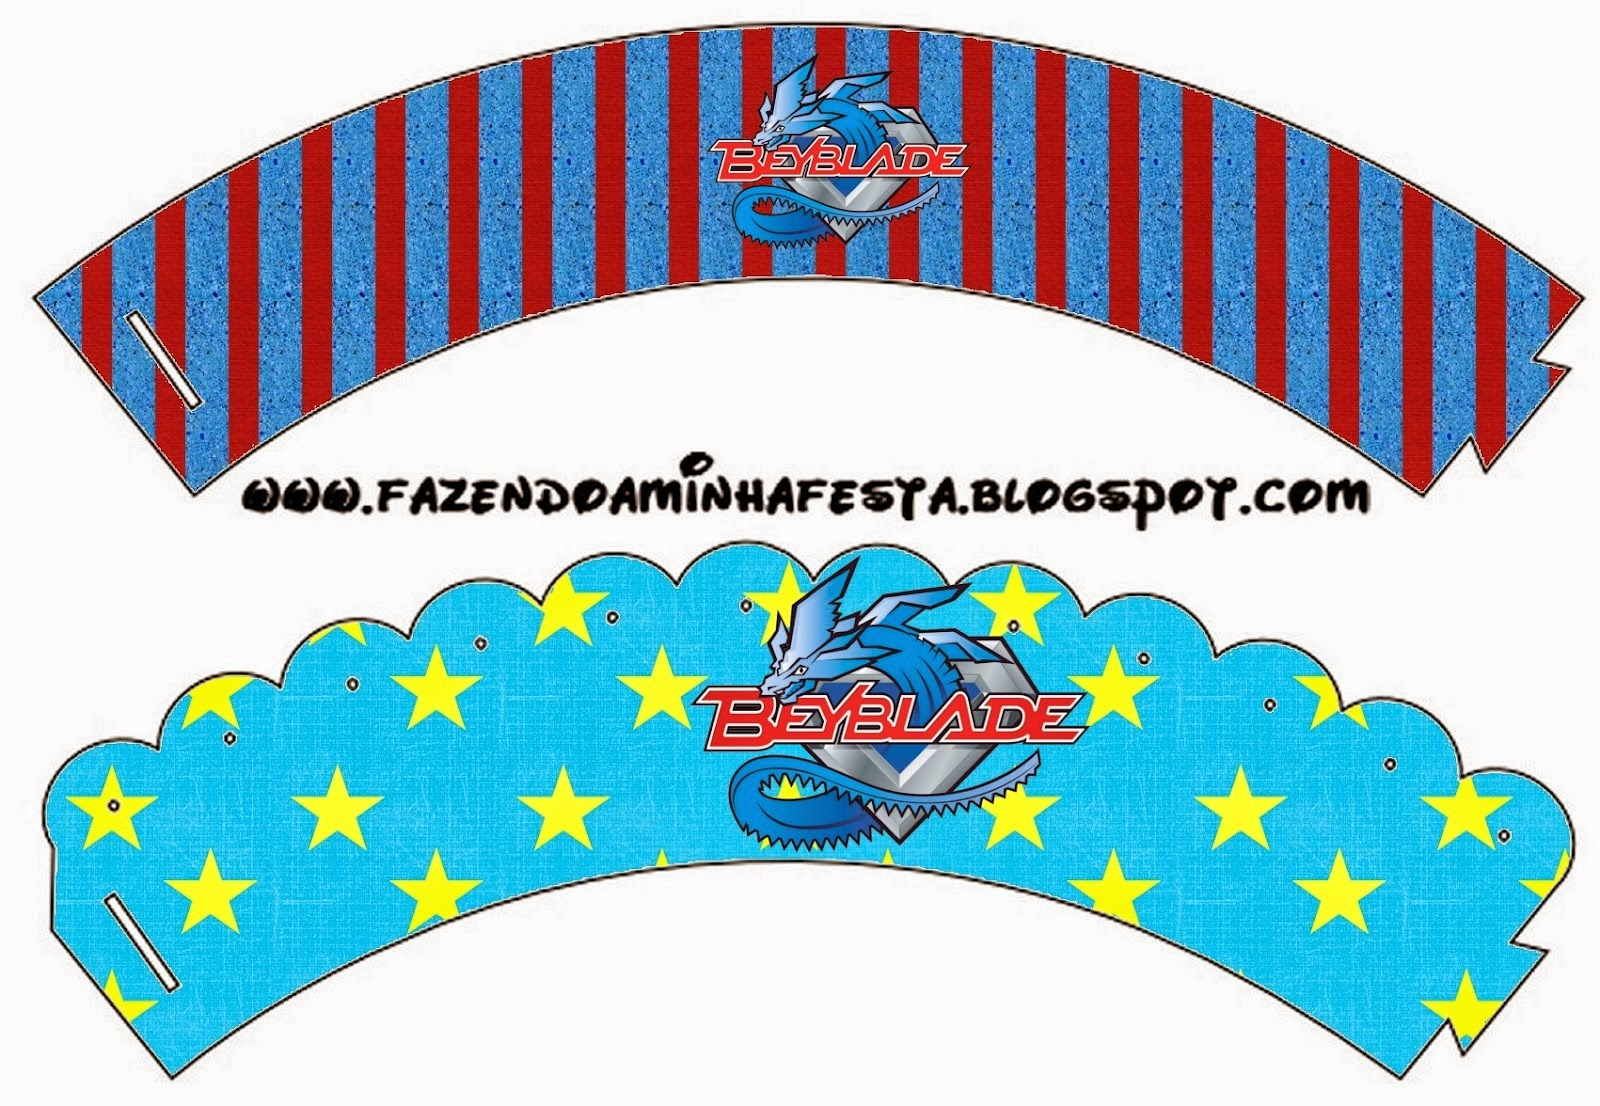 Beyblade Free Party Printable Oh My Fiesta For Geeks